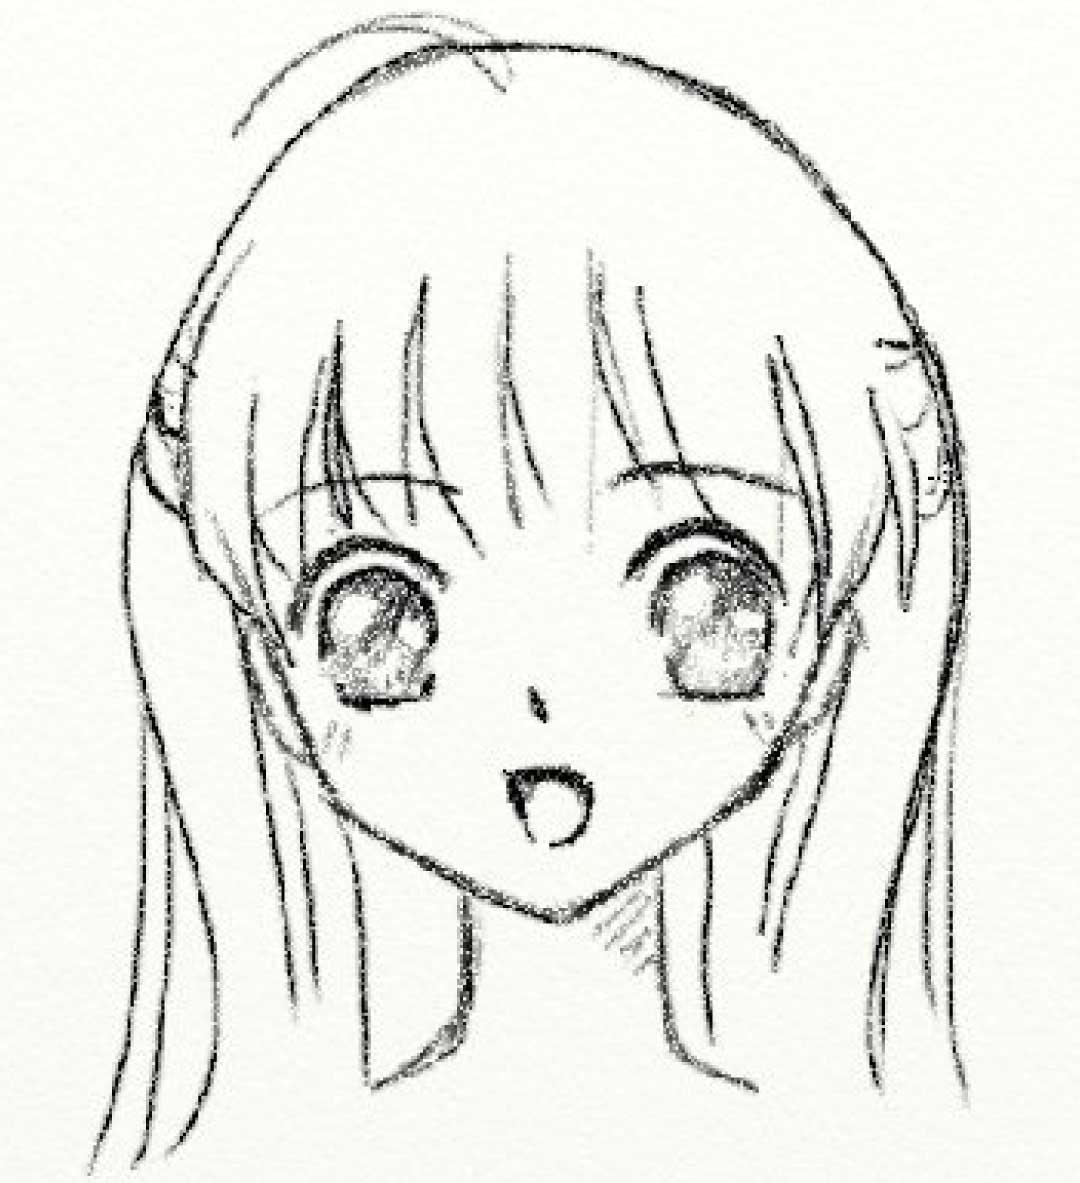 Kumpulan Mewarnai Gambar Sketsa Mata Anime Desain Interior